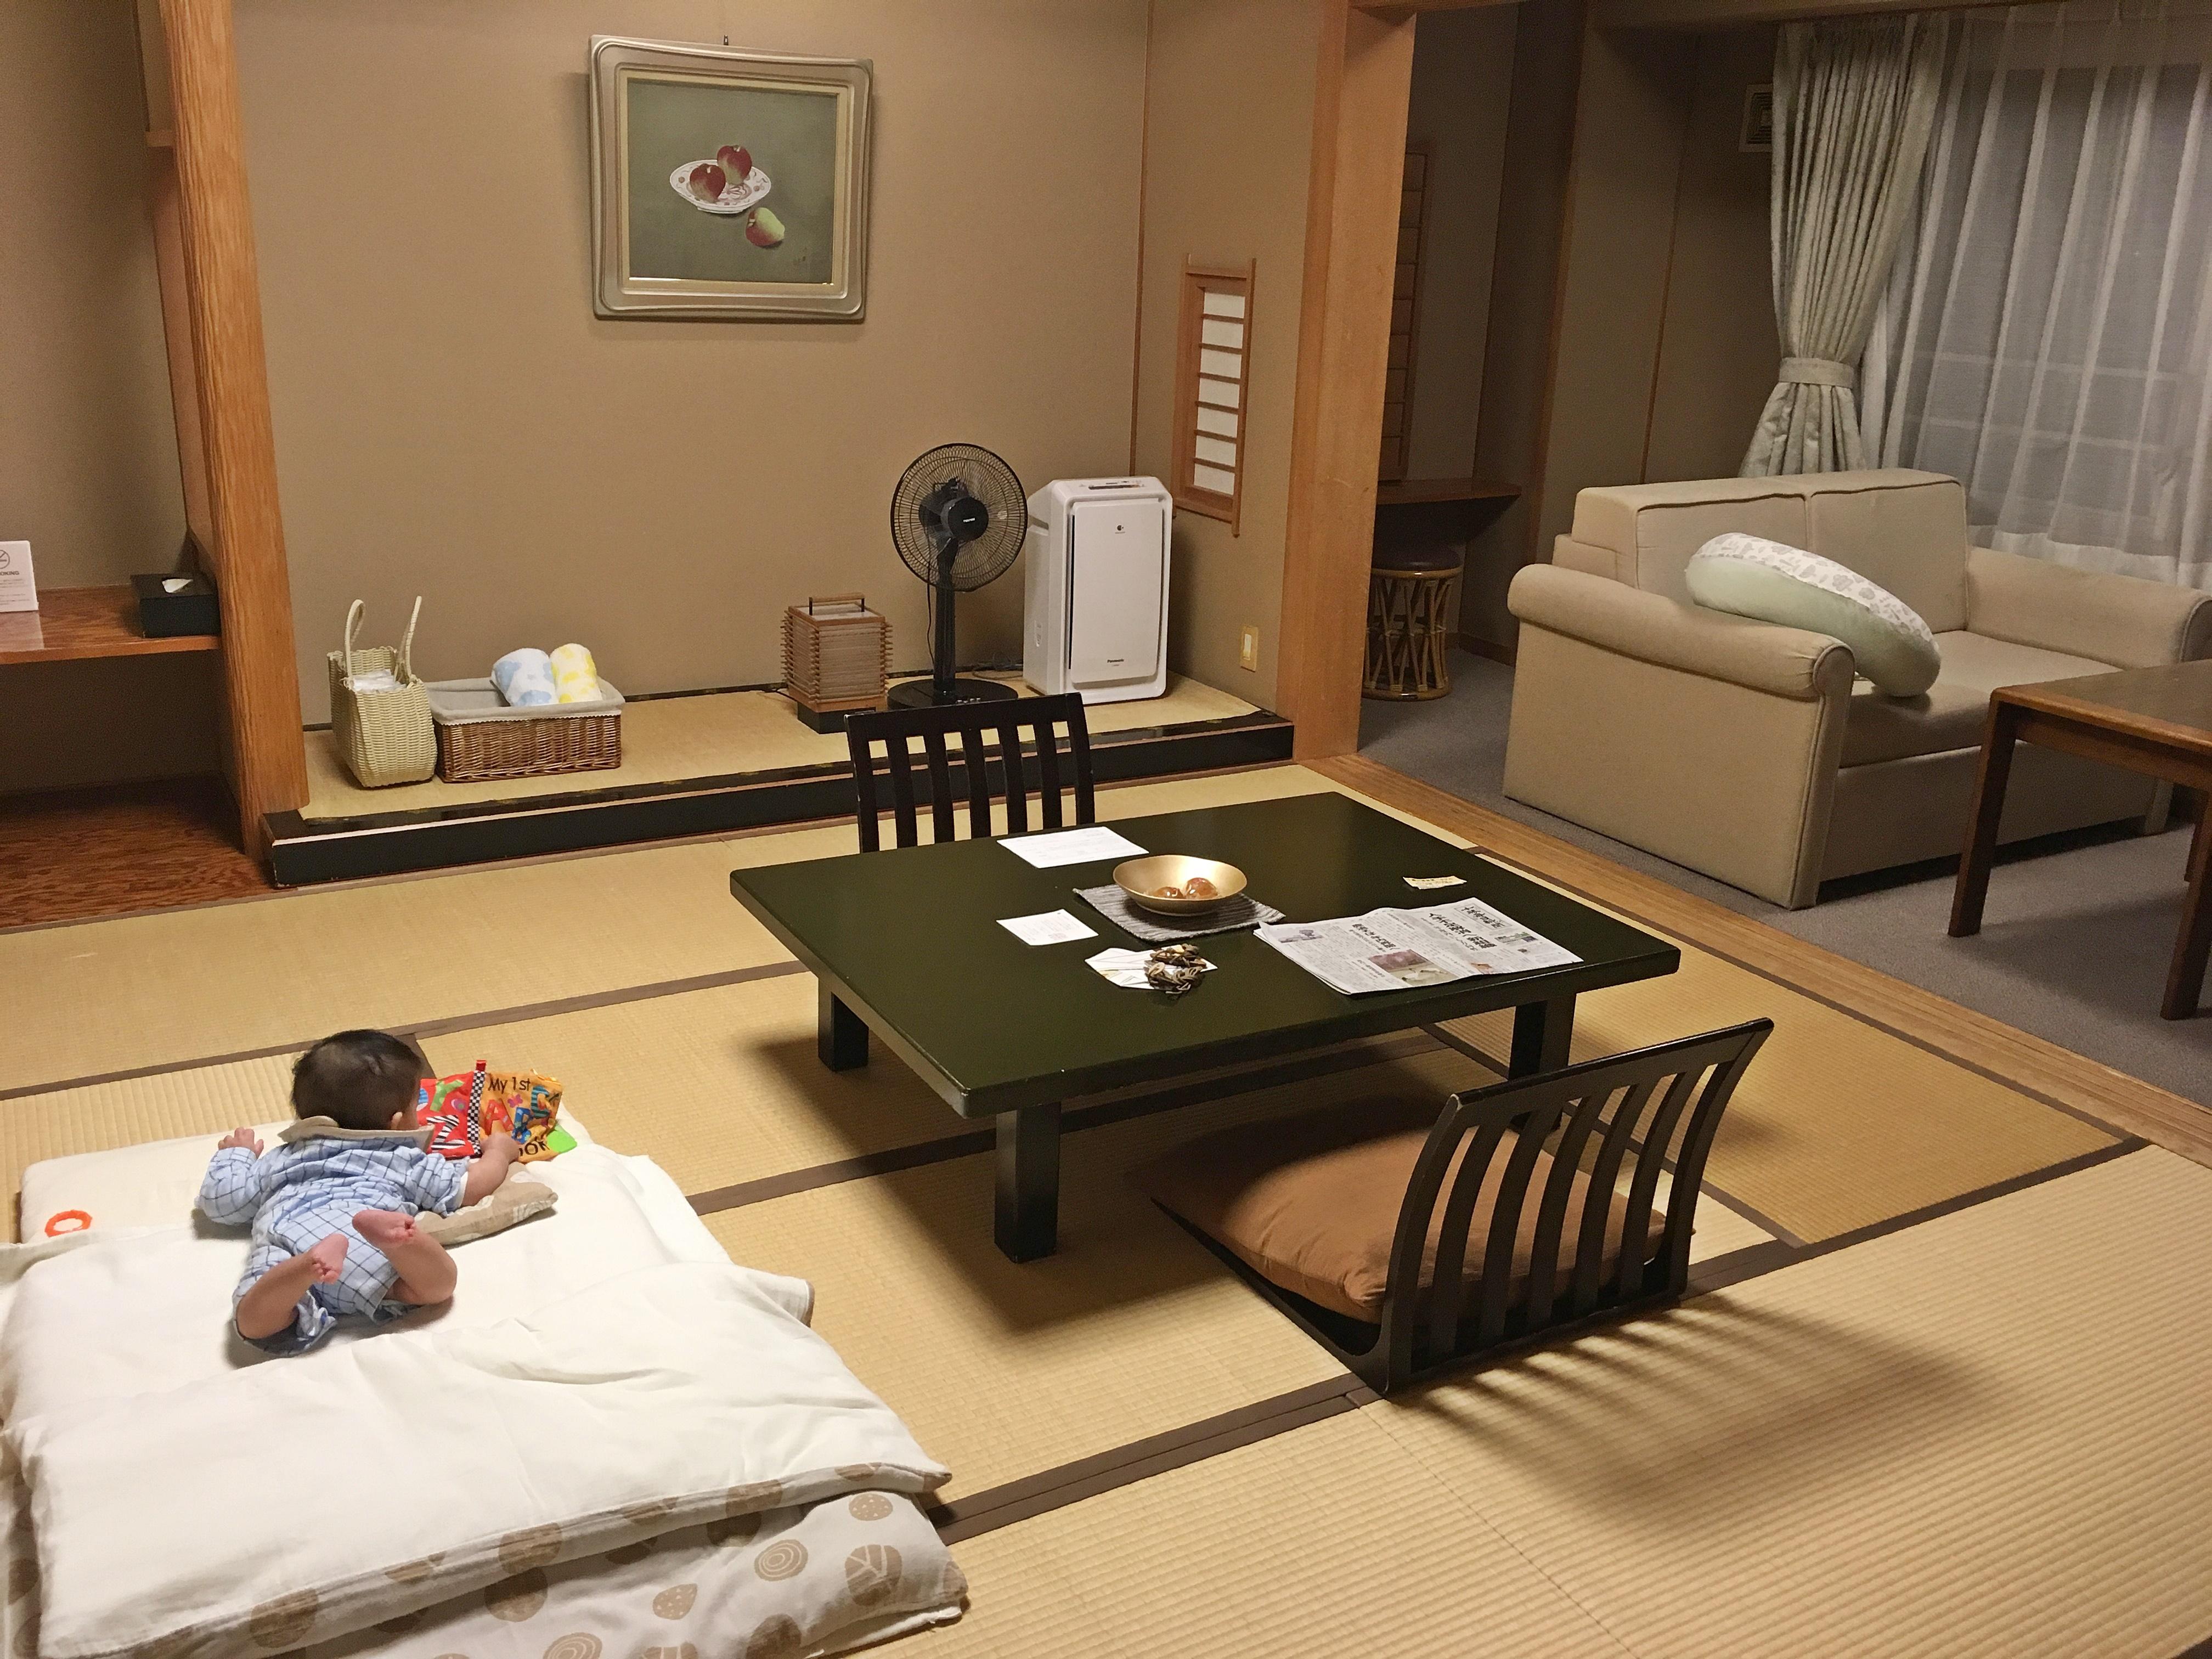 十勝川温泉第一ホテル豆陽亭 12.5畳和室_181108.JPG